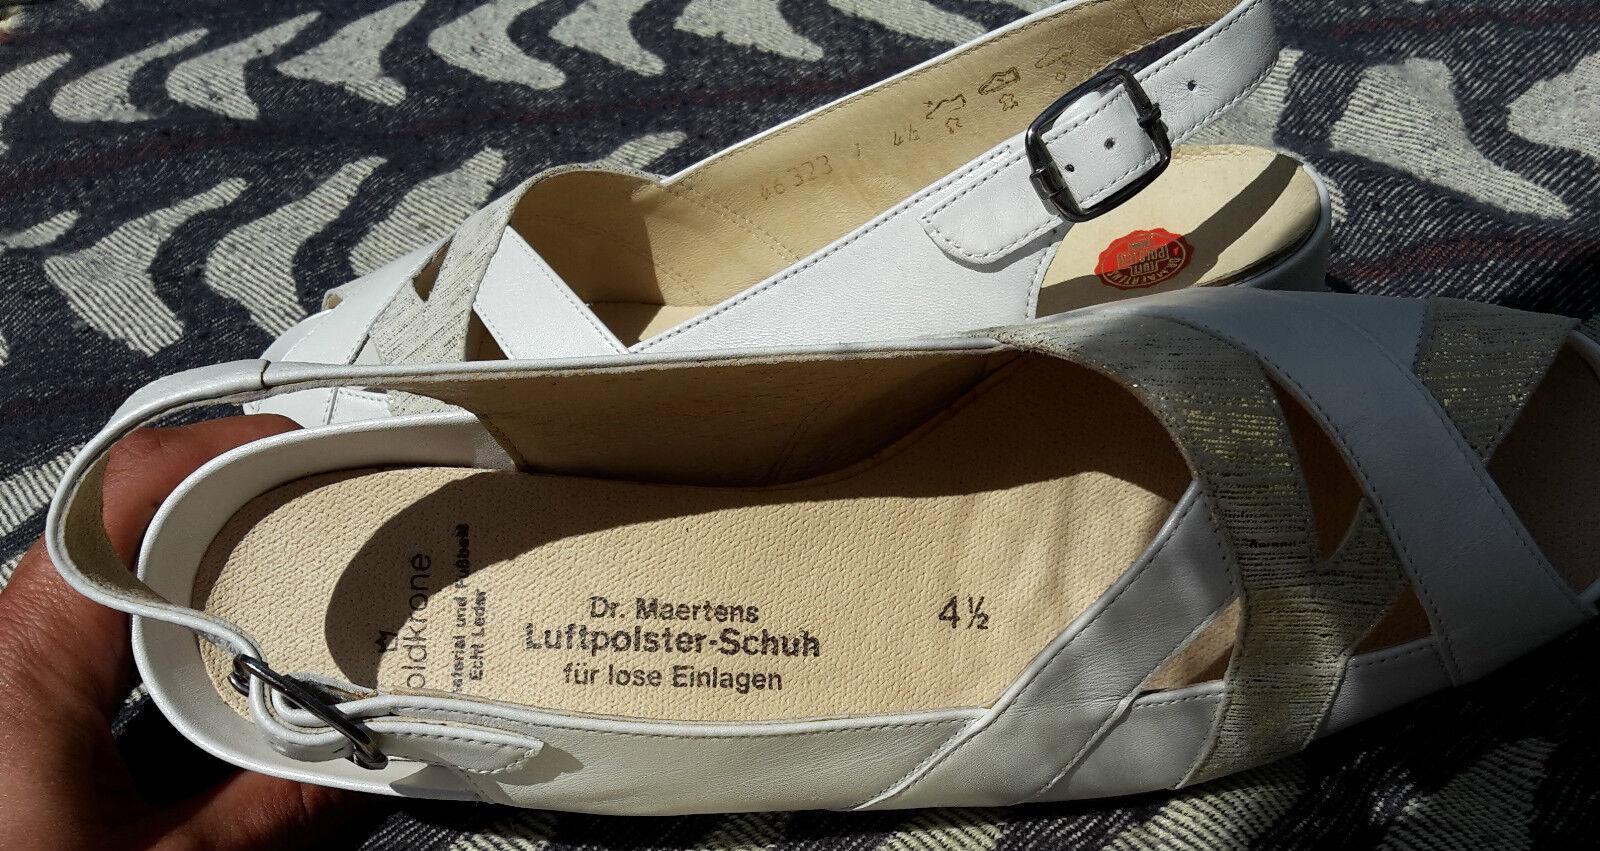 Dr. Größe Martens - Goldkrone - Größe Dr. 4,5 - 37 -weiß - gold - Sandale 317fb1